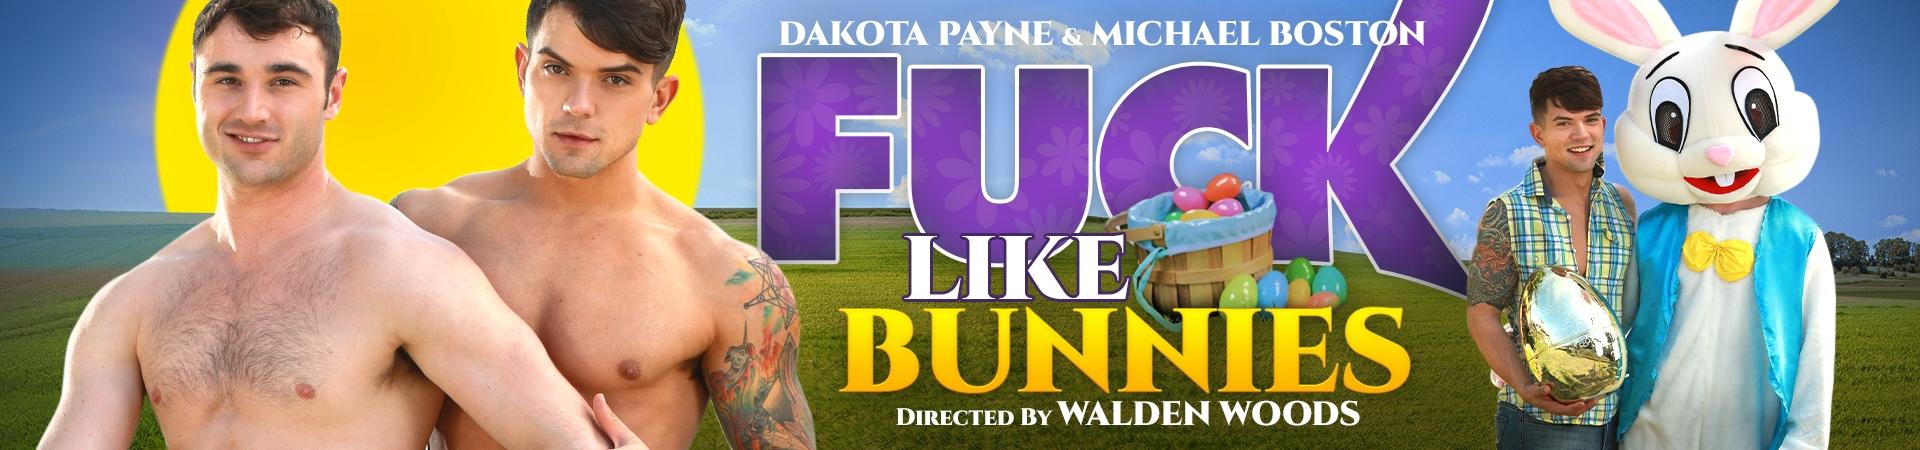 Fuck Like Bunnies Featuring Dakota Payne and Michael Boston